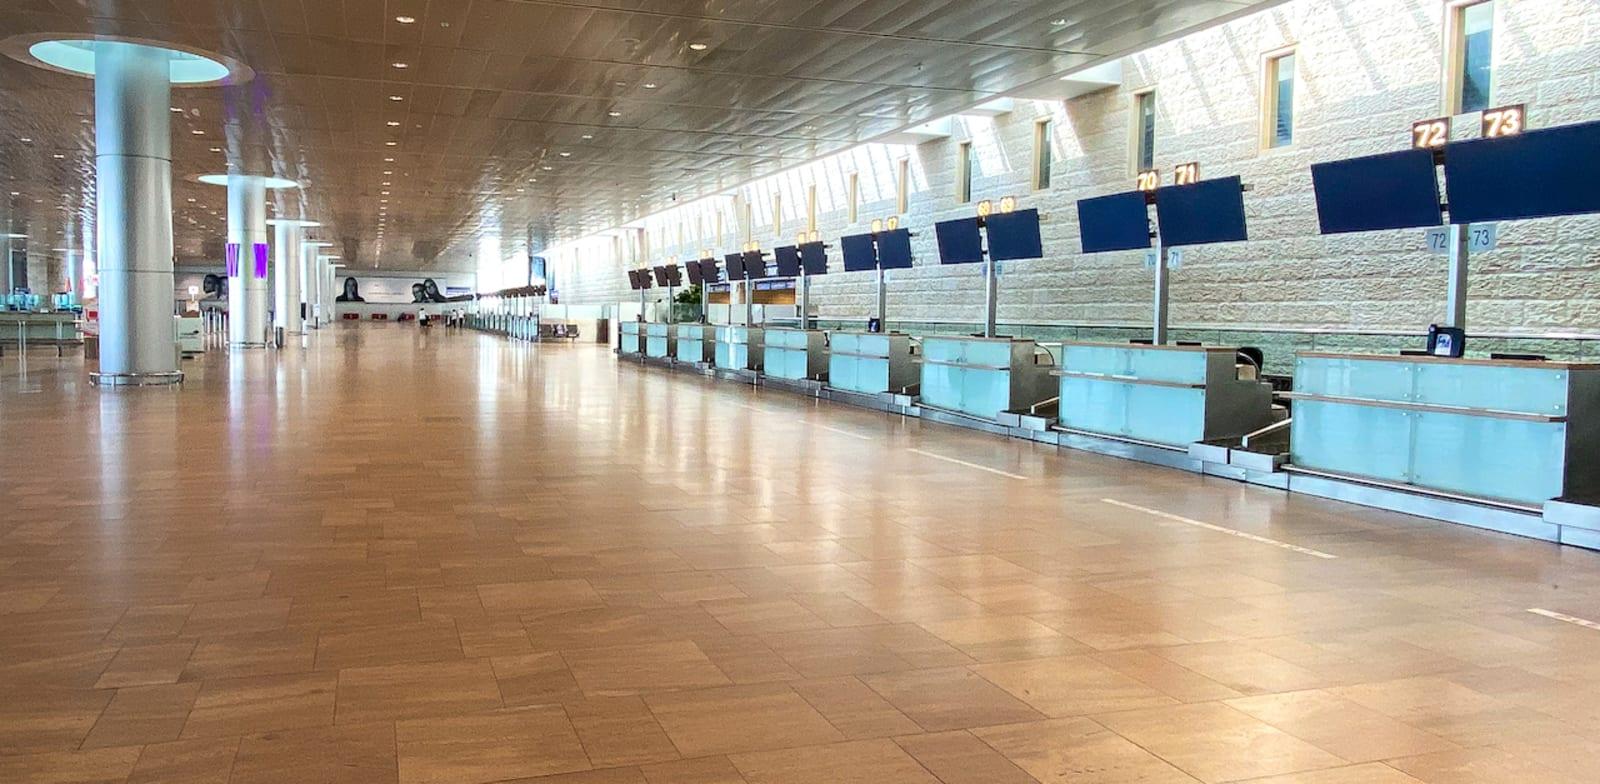 Ben Gurion Airport Credit: Yossi Fatal